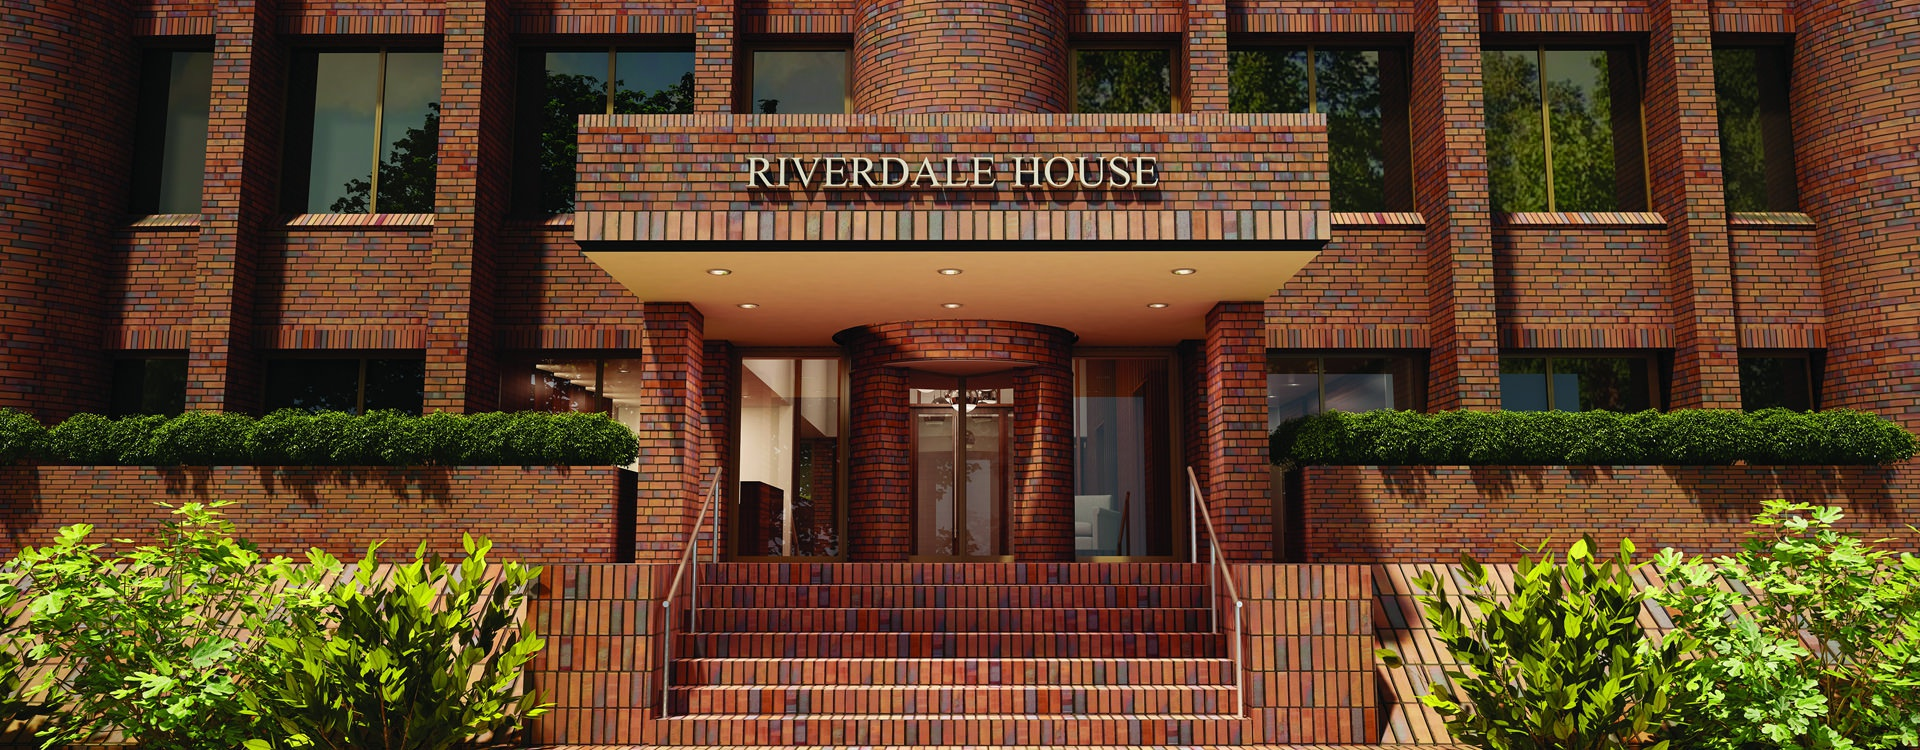 Riverdale House image